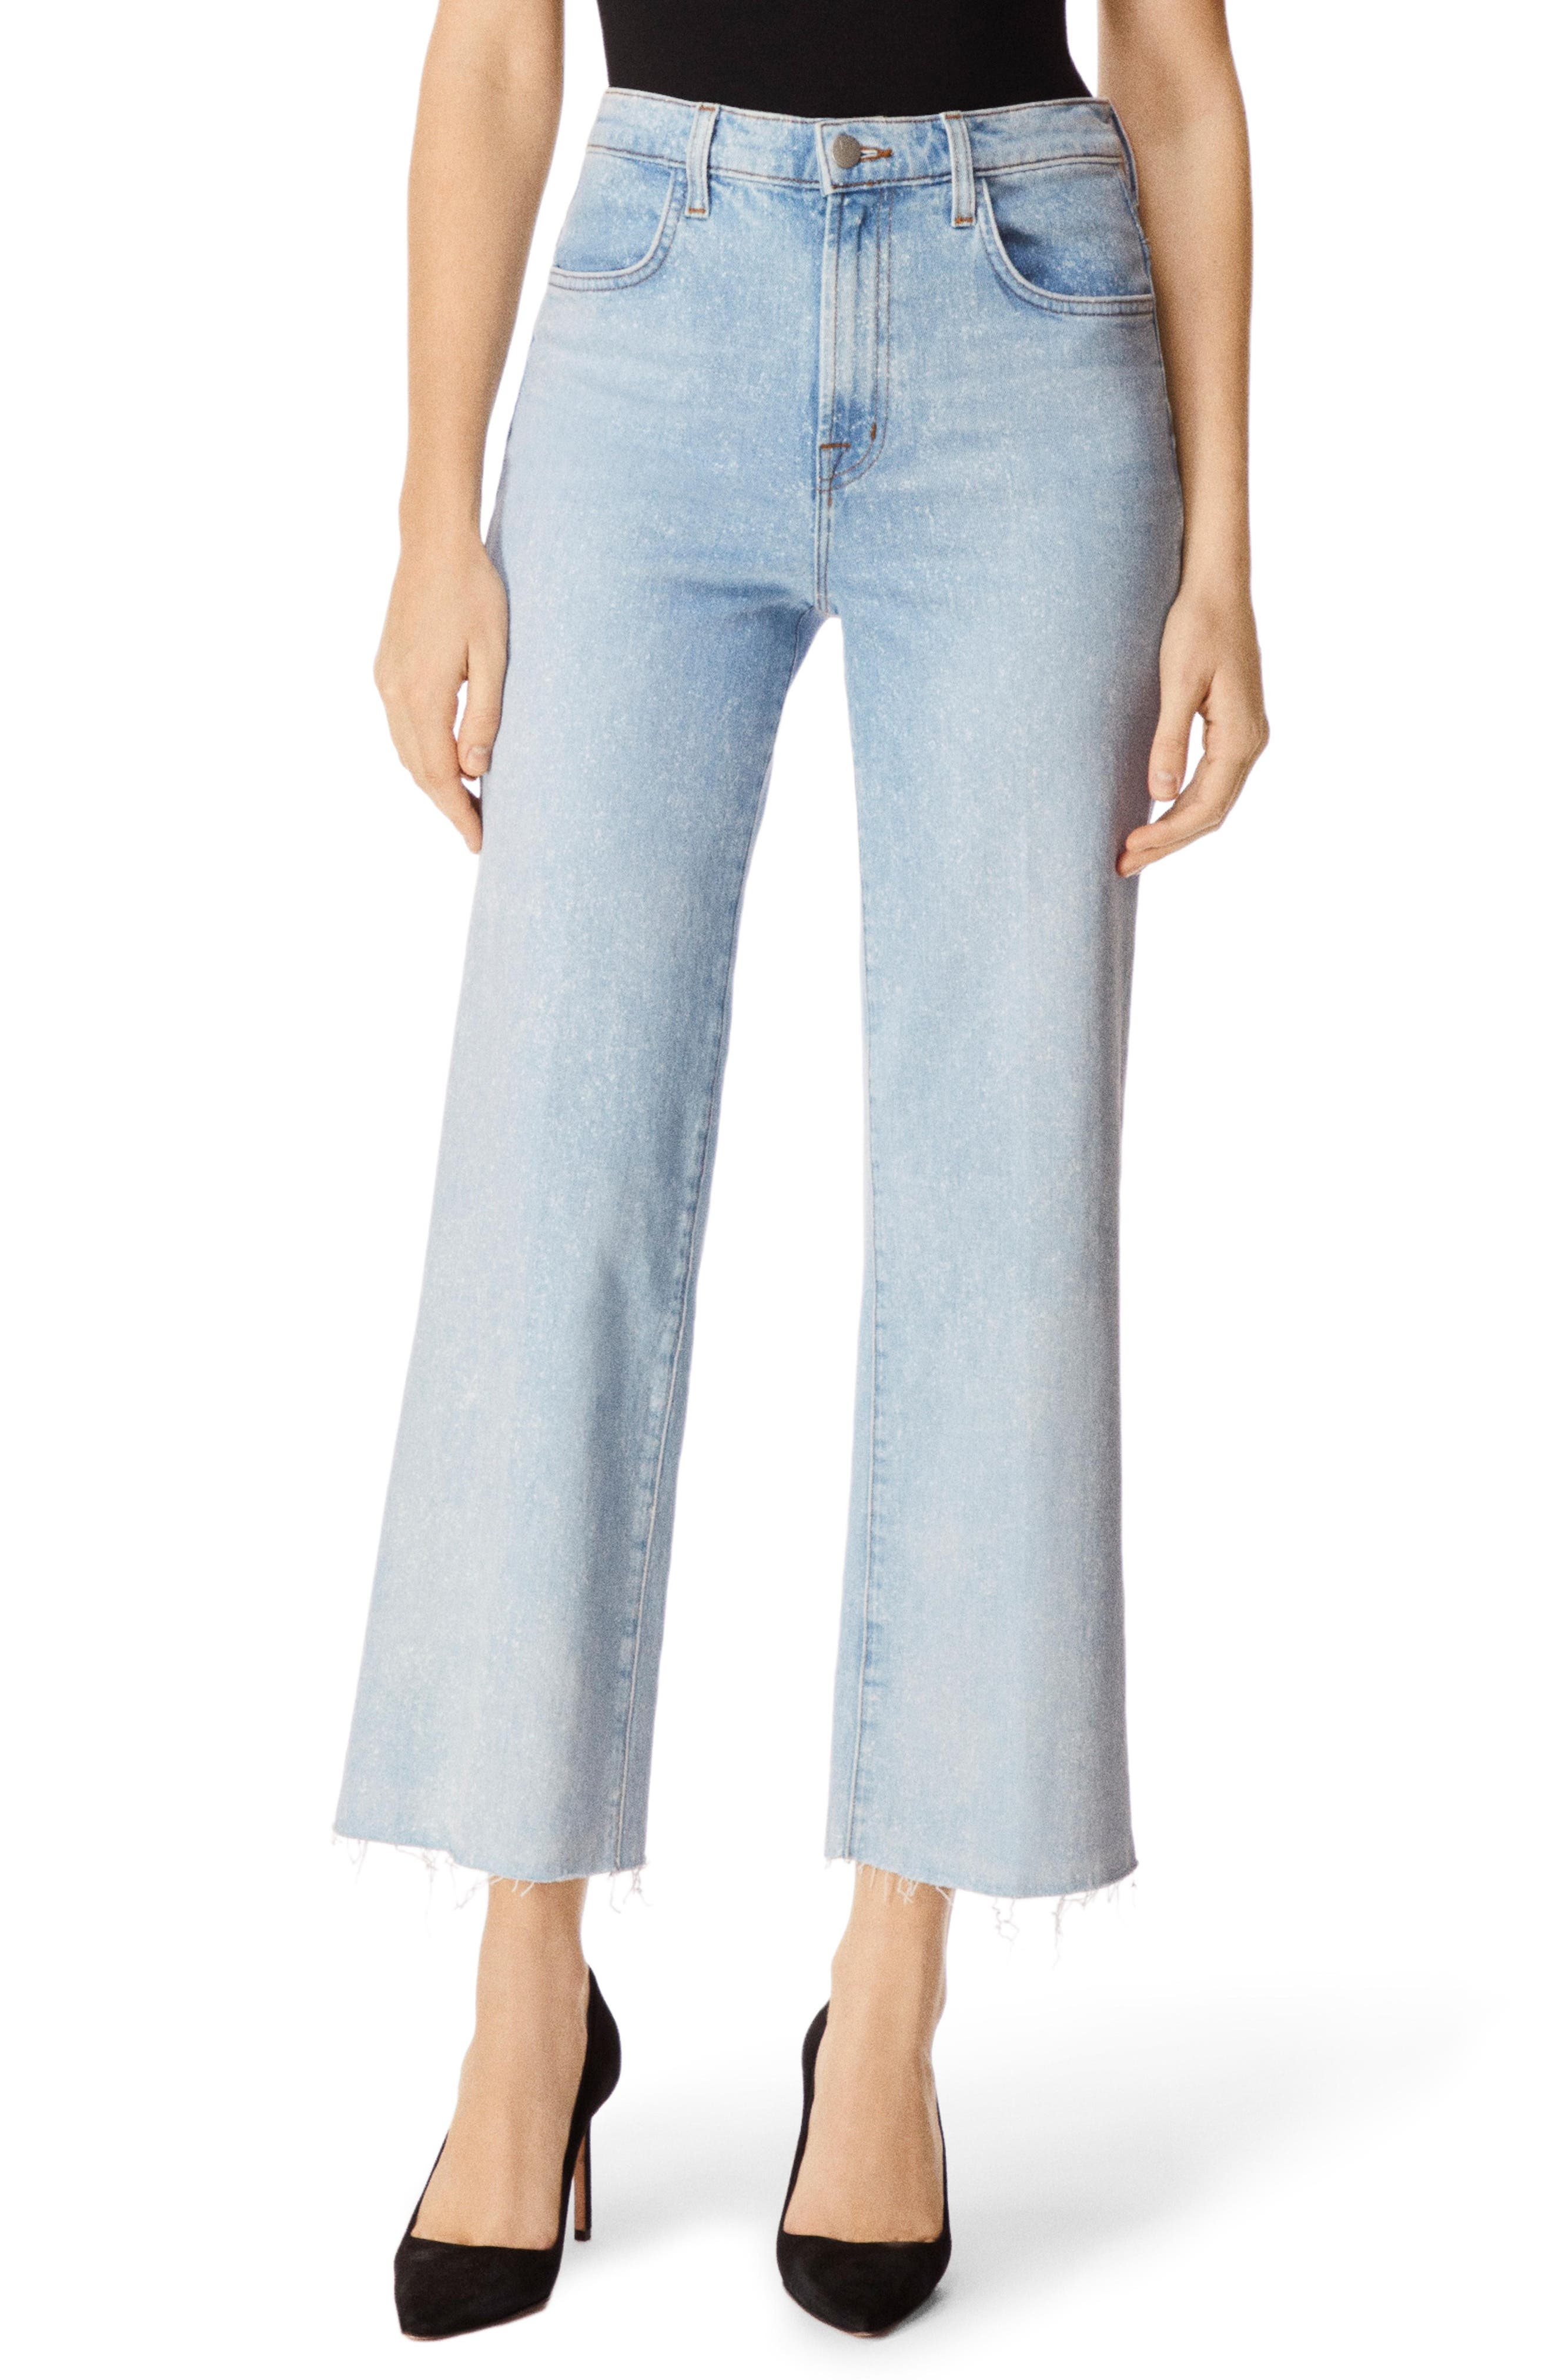 J BRAND Joan High Waist Crop Wide Leg Jeans, Main, color, AERGLO